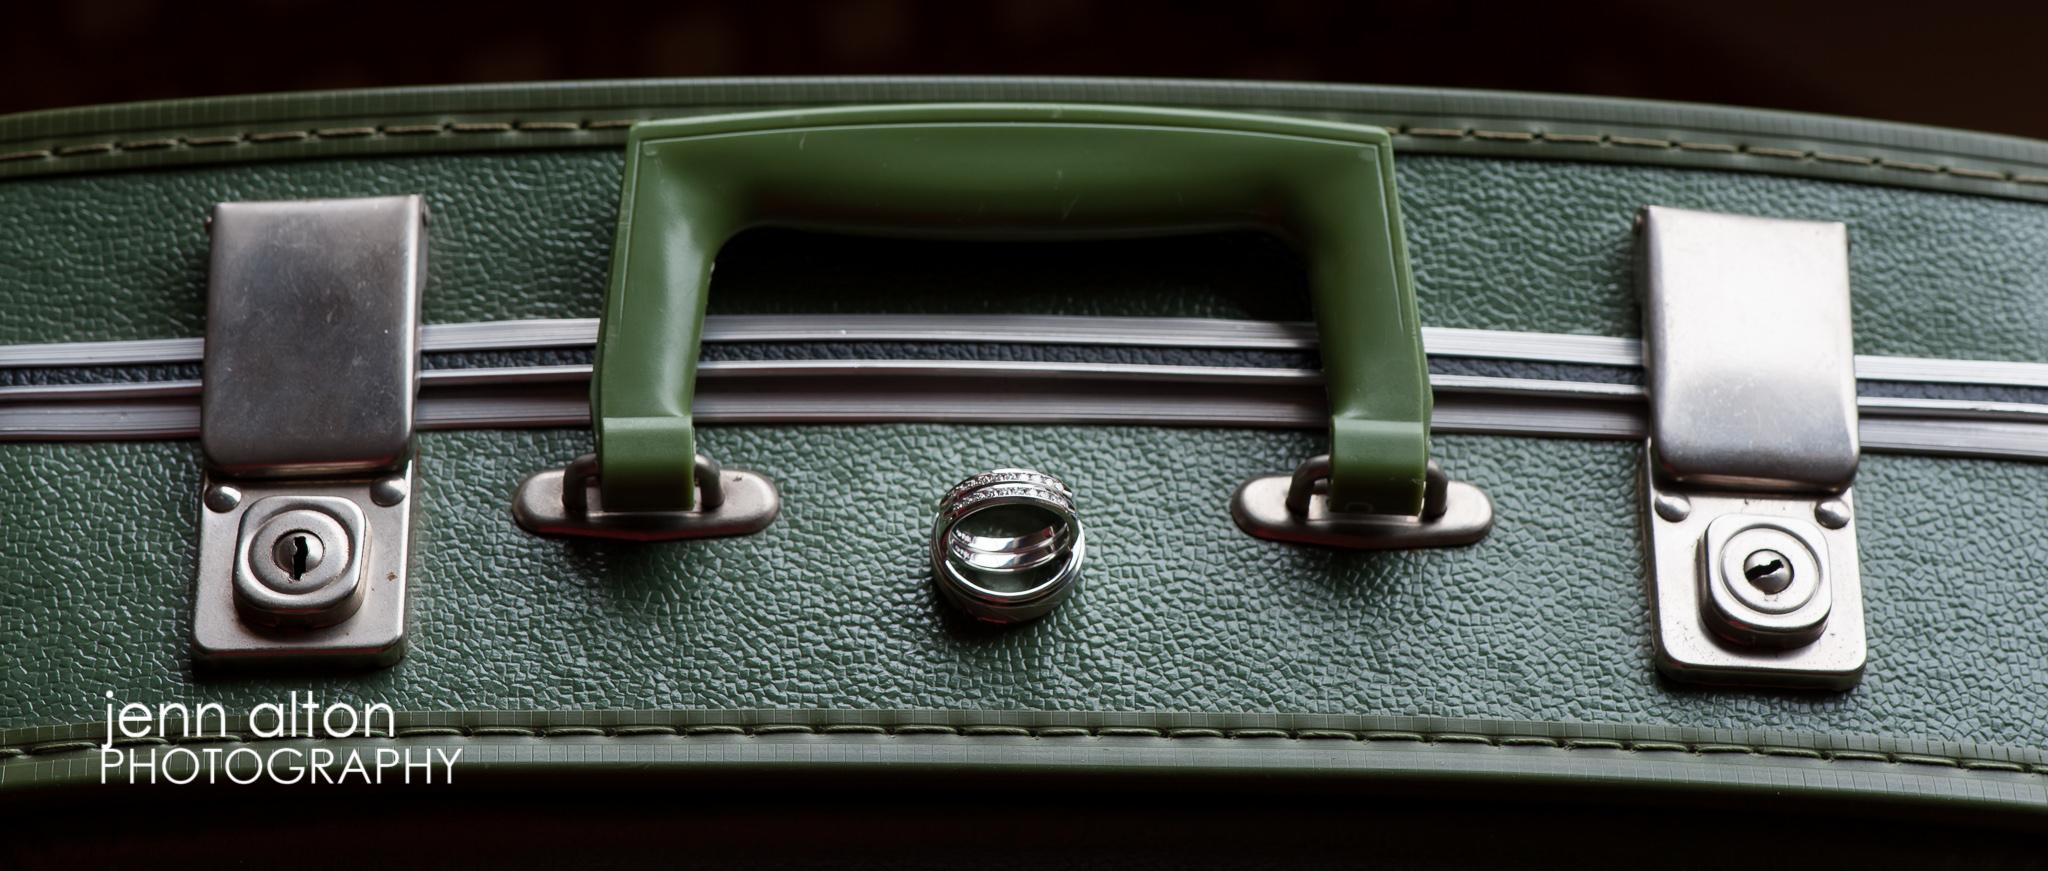 Wedding bands on vintage suitcase, detail